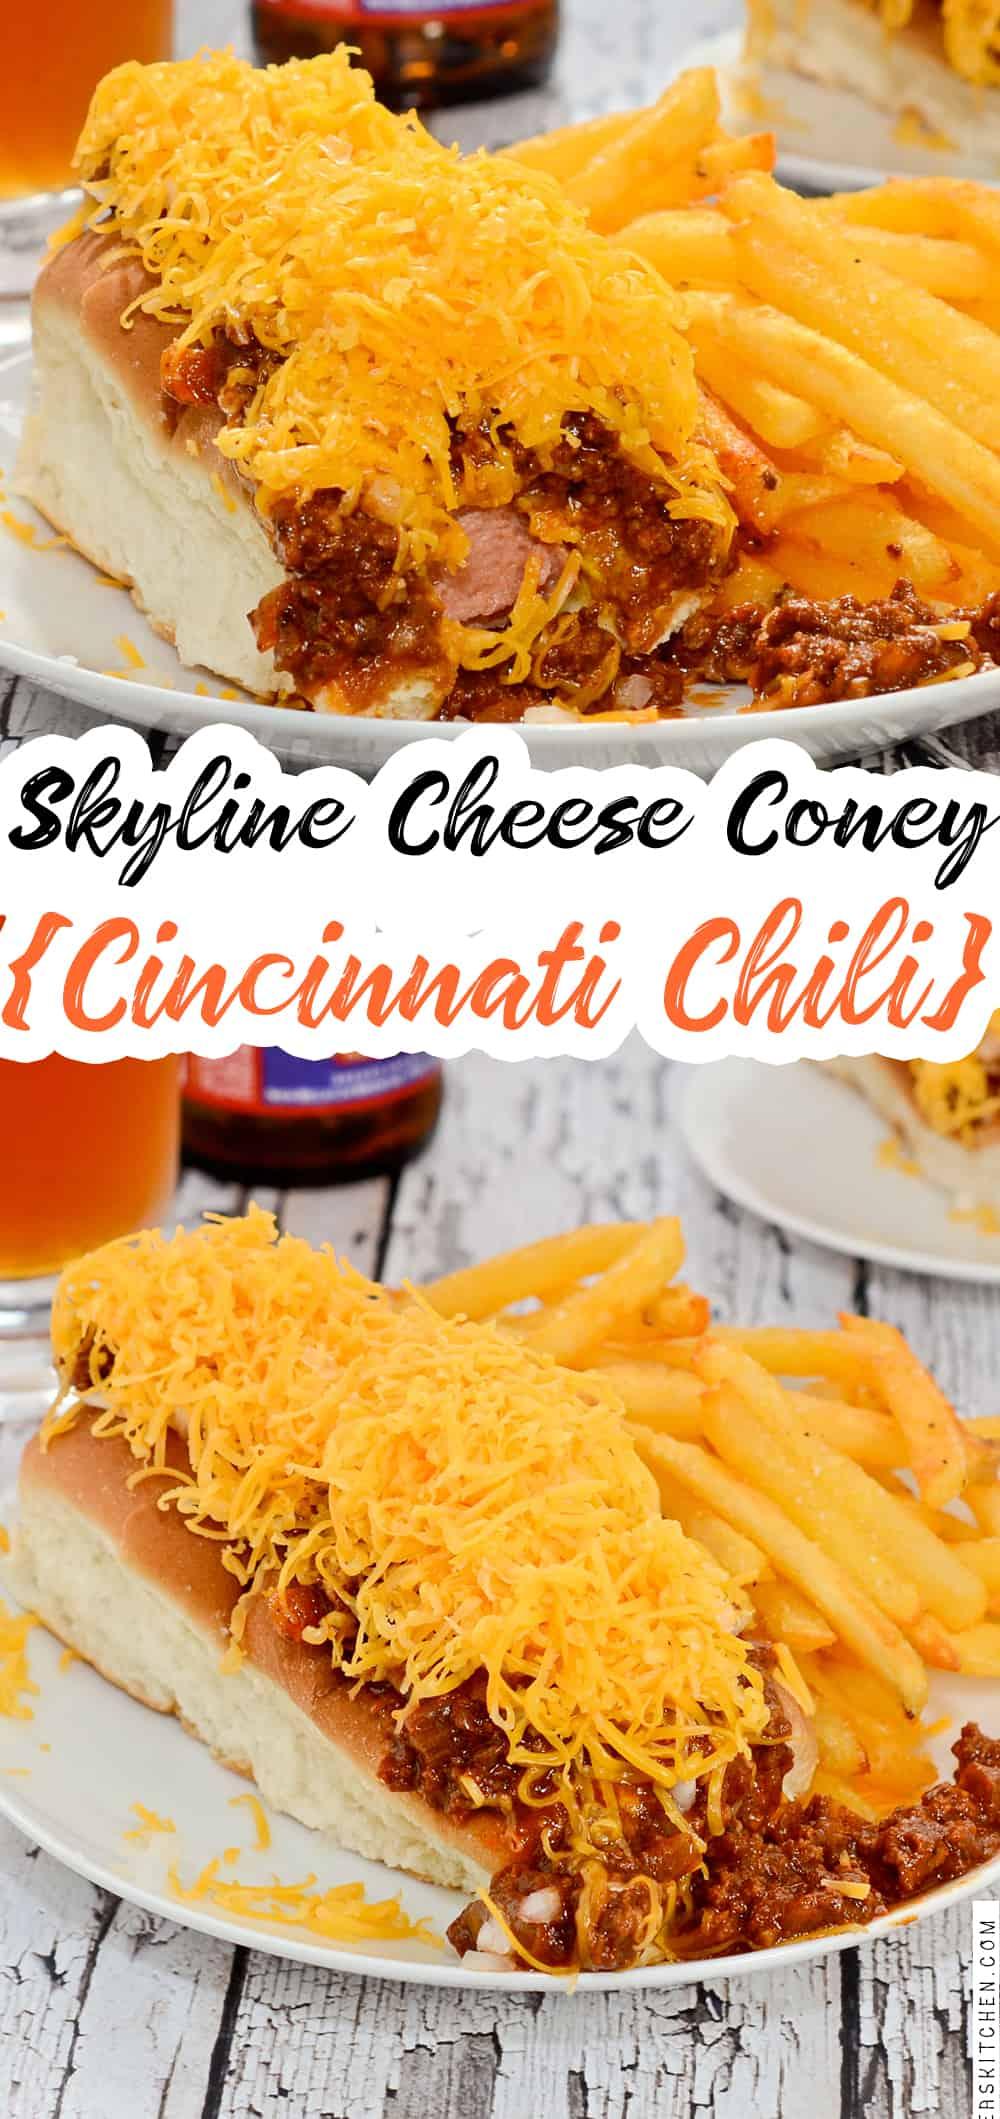 Skyline Cheese Coney {Cincinnati Chili}